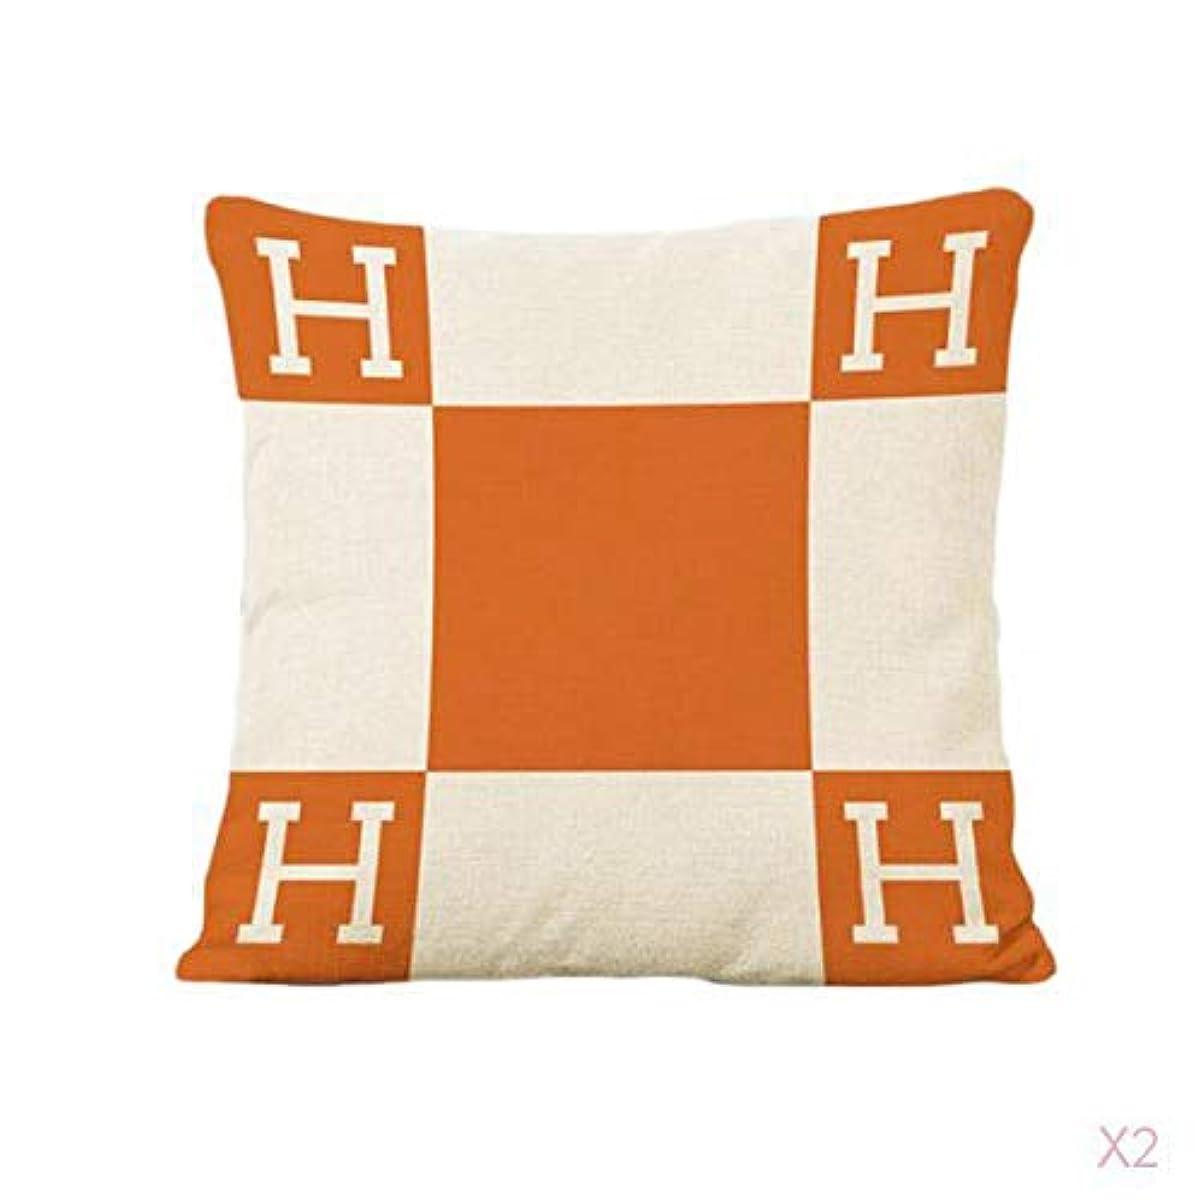 FLAMEER コットンリネンピローケース腰投げクッションカバーH-グリッド家の装飾オレンジ